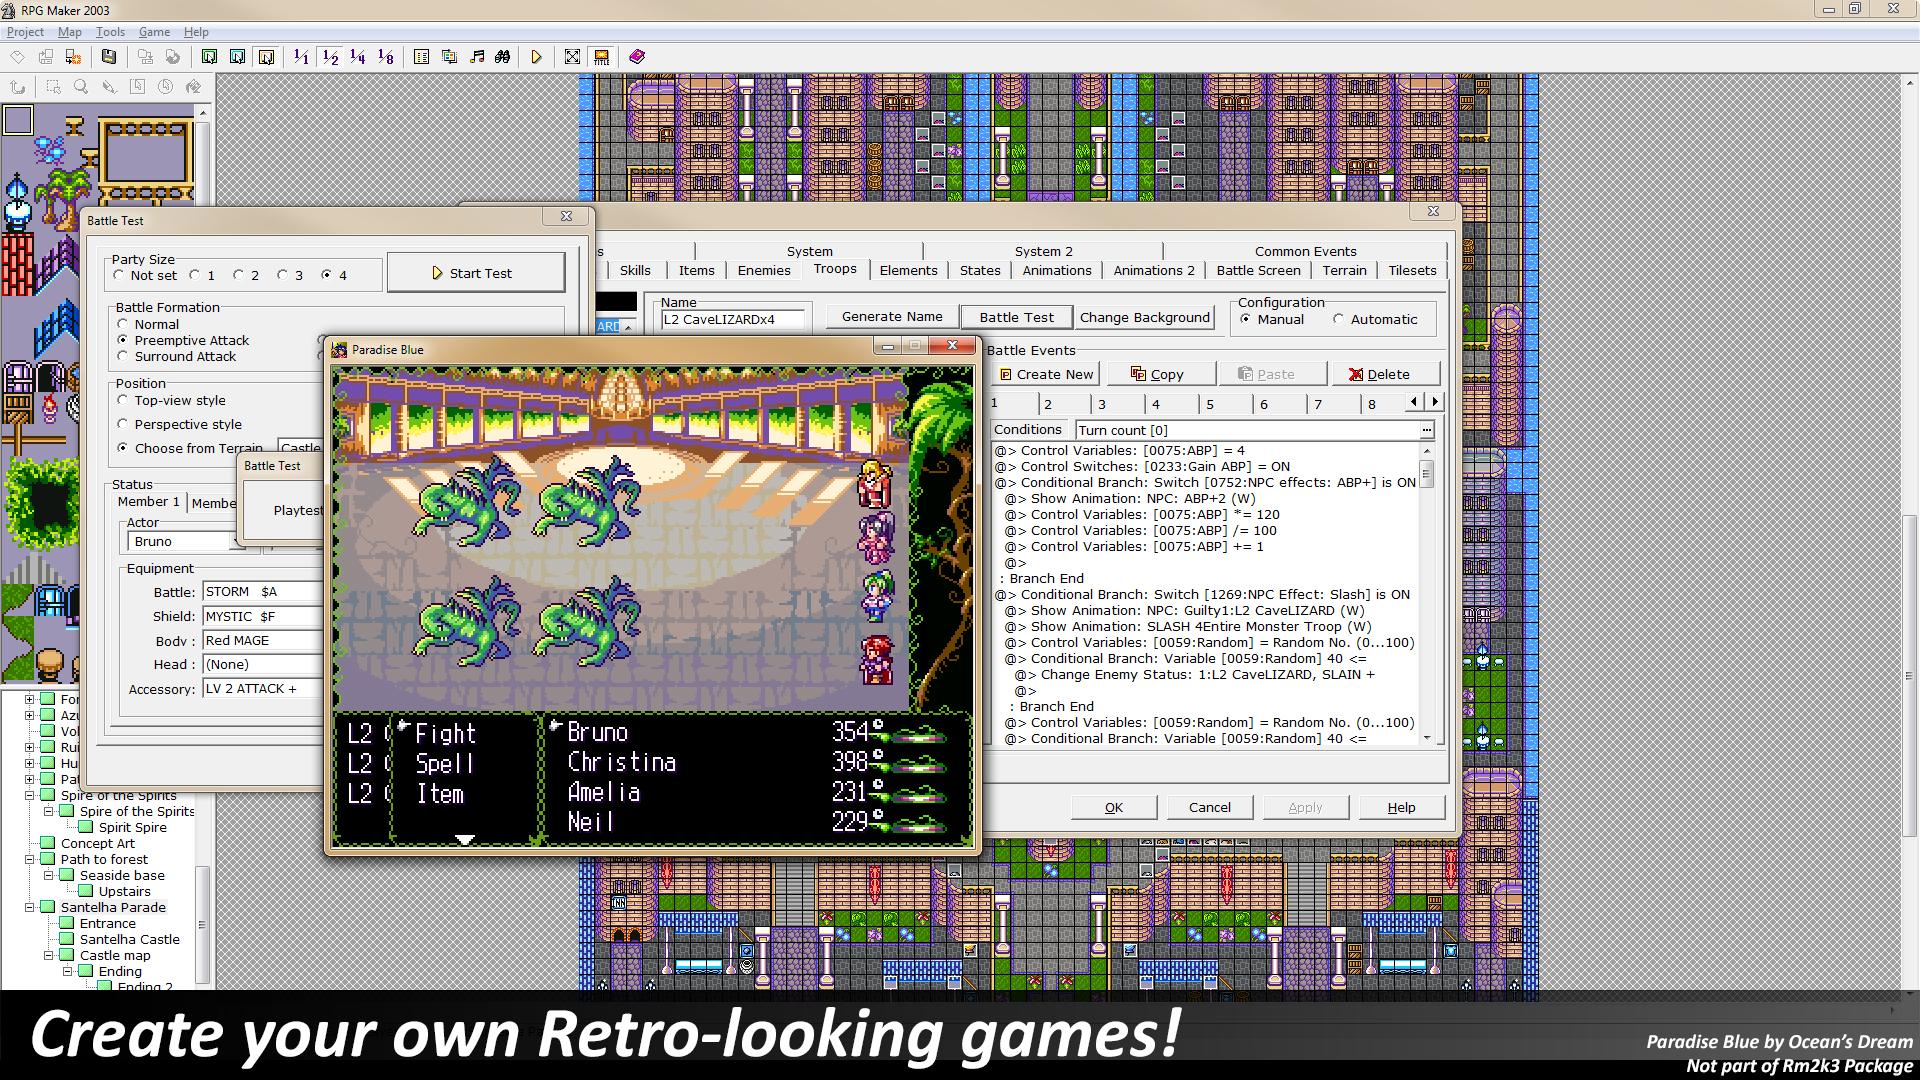 Amazon RPG Maker 2003 [ line Code] Software